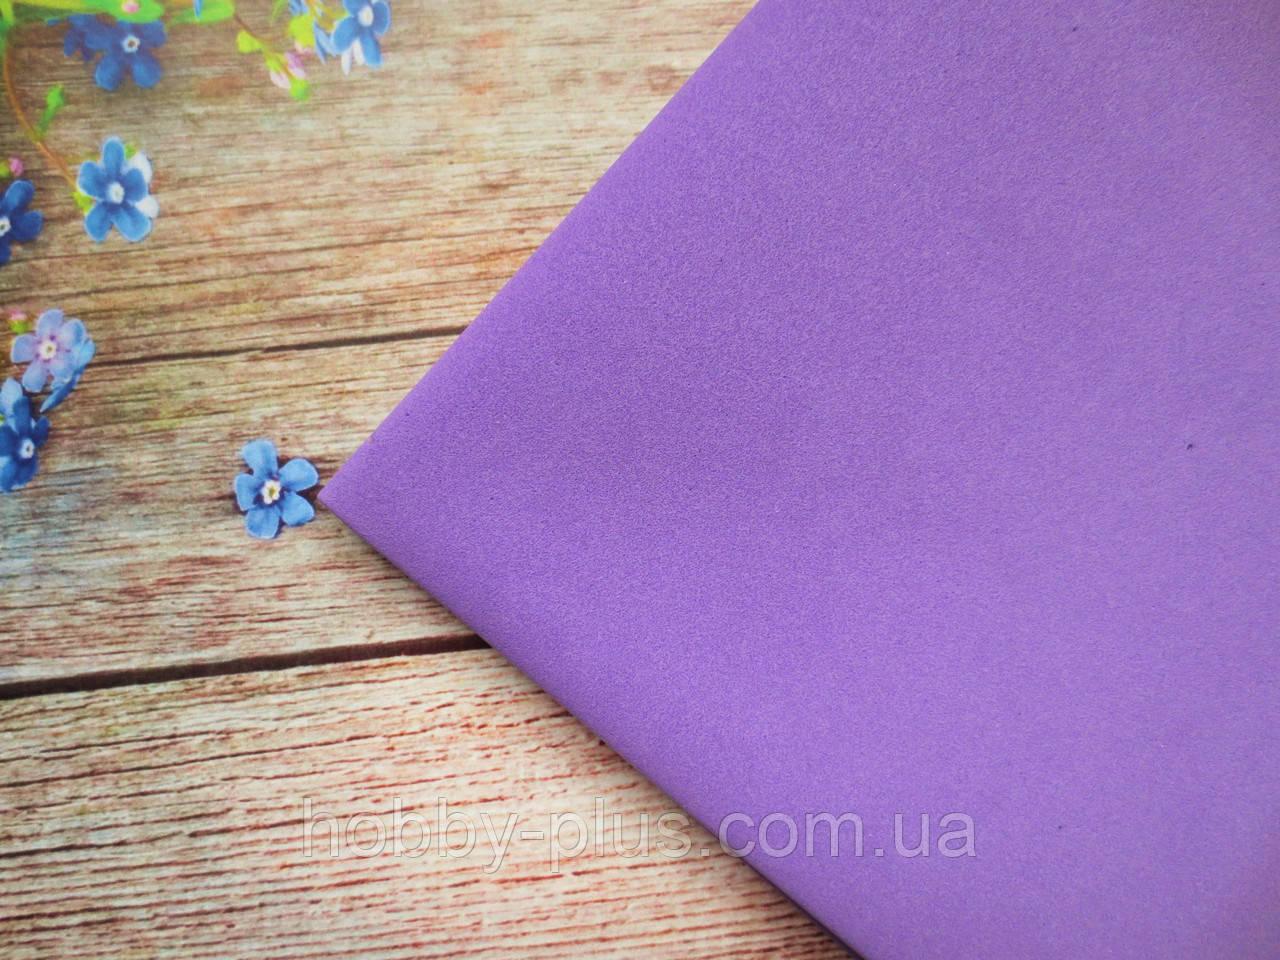 Фоамиран 1 мм, 50х50 см, цвет фиолетовый